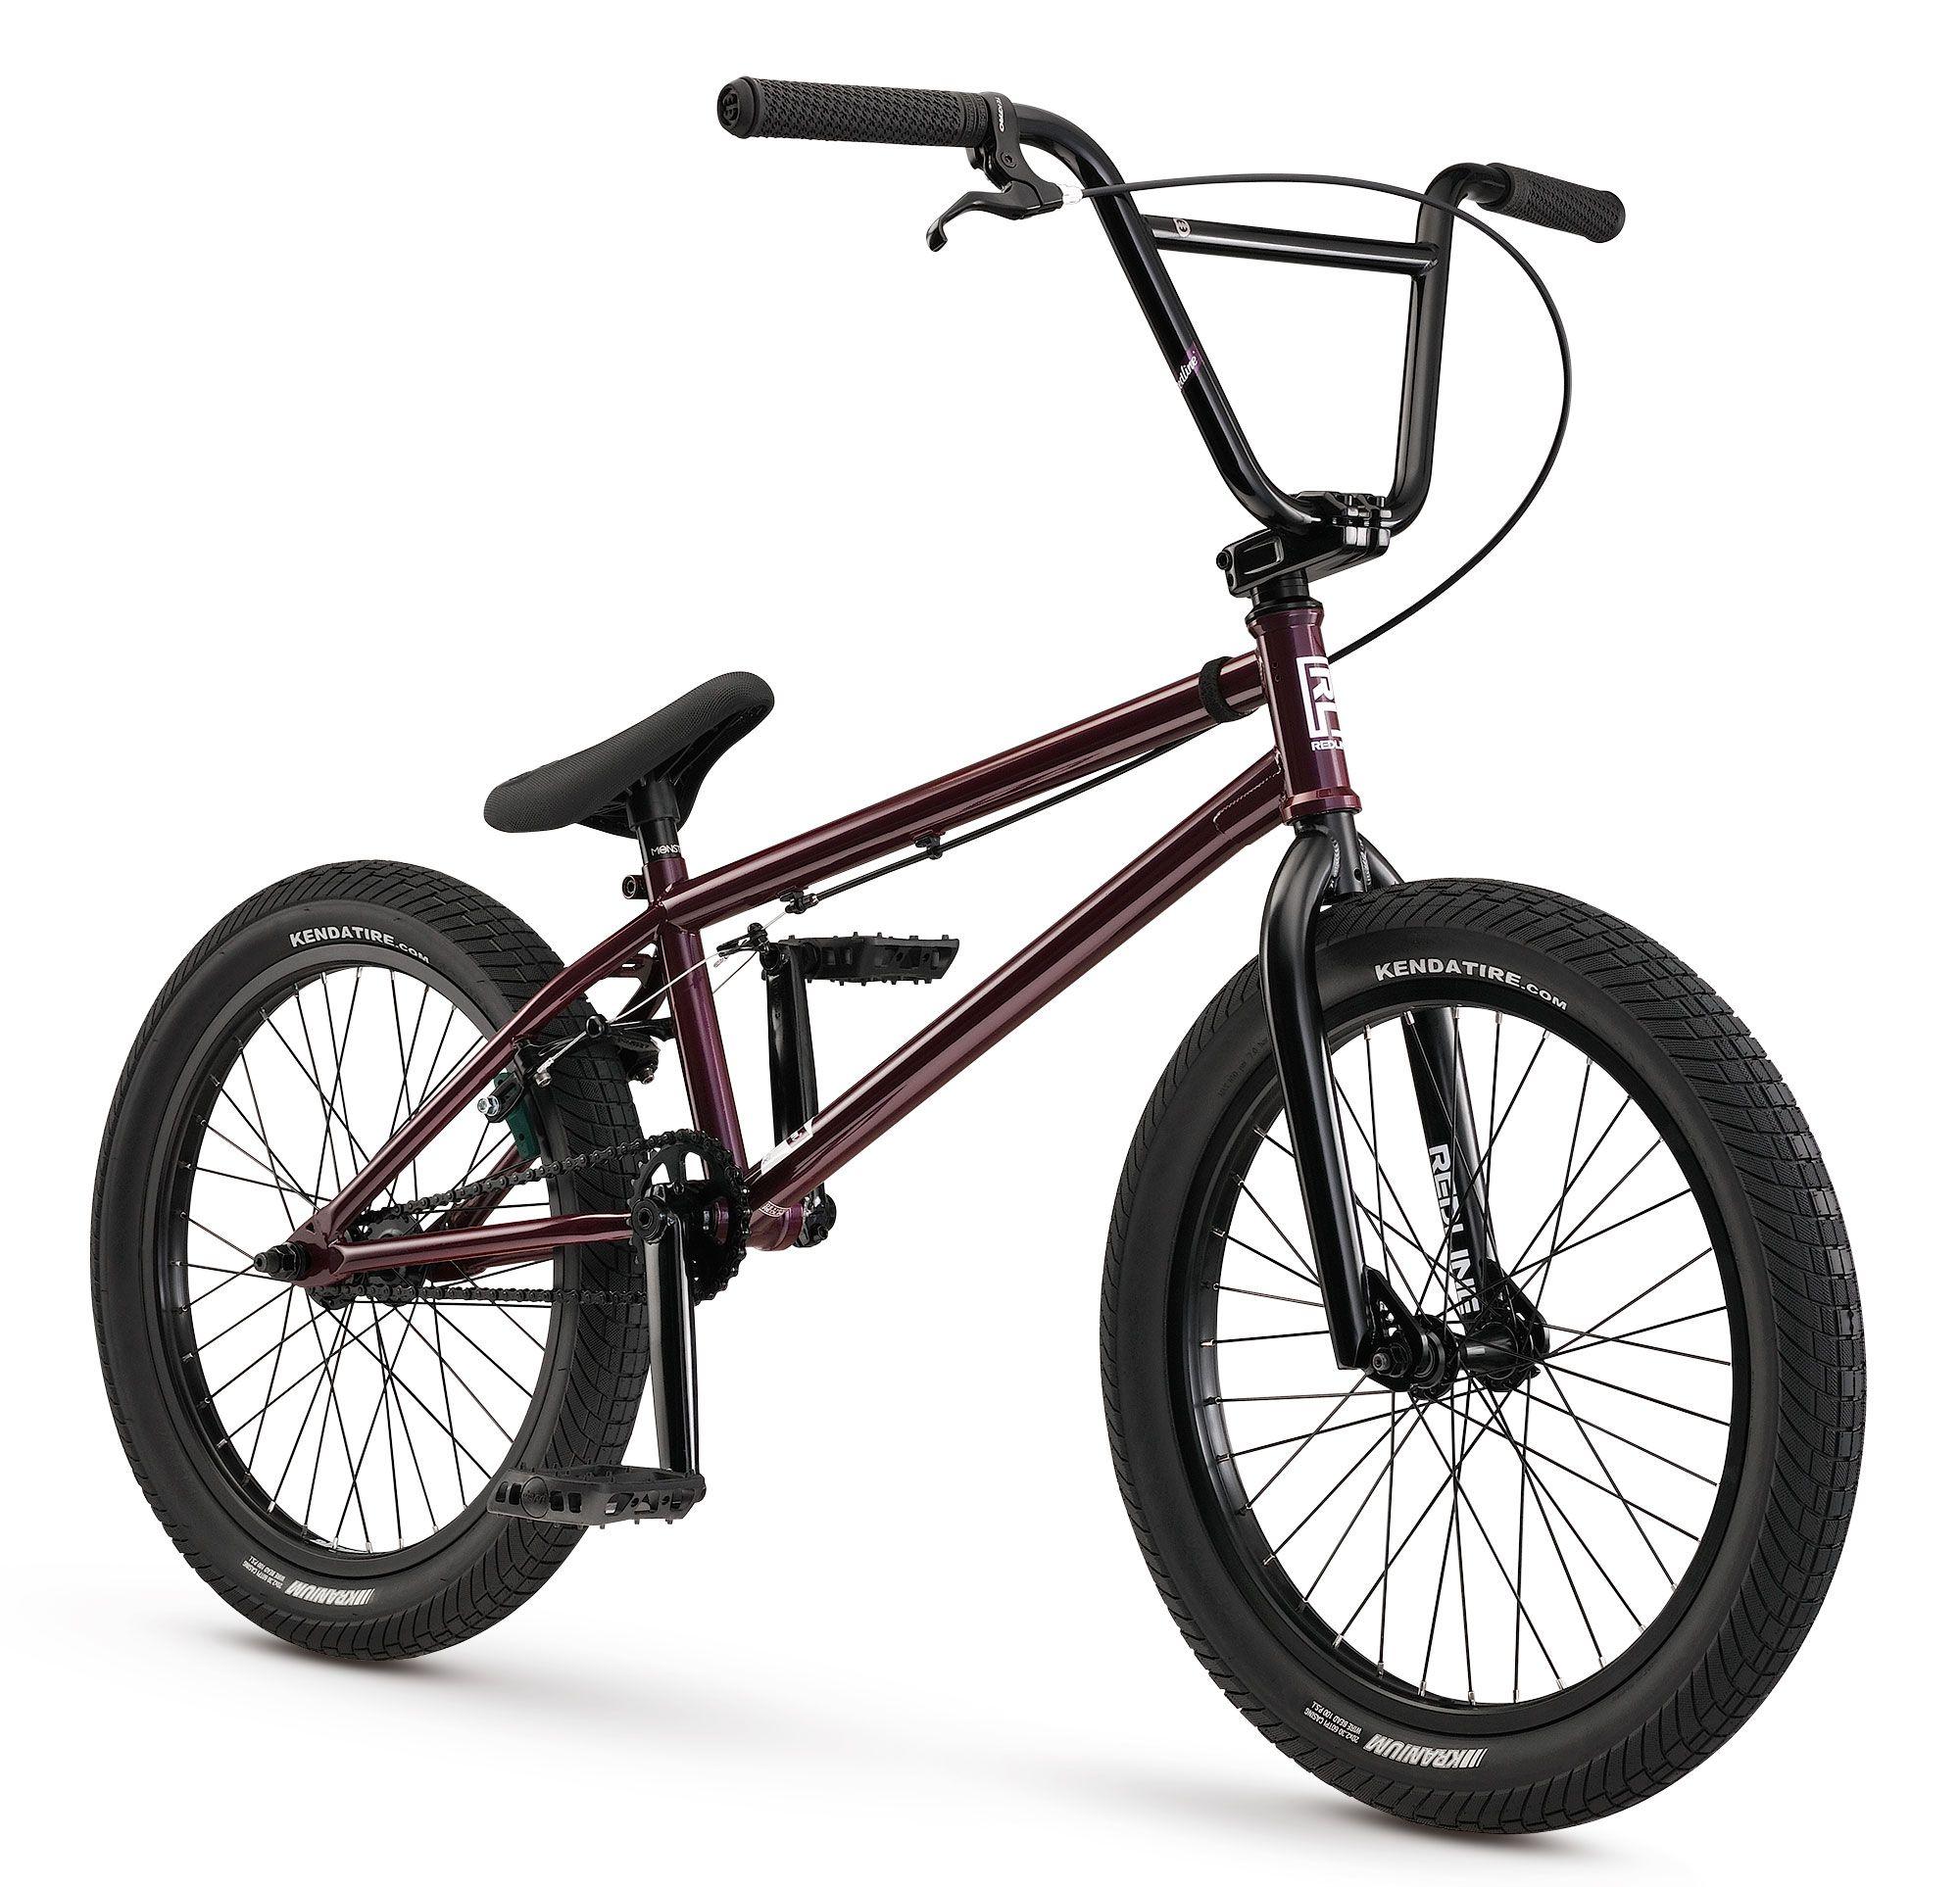 2014 random redline bicycles bmx pinterest bmx bike and bmx Custom Street Motorcycles 2014 random redline bicycles